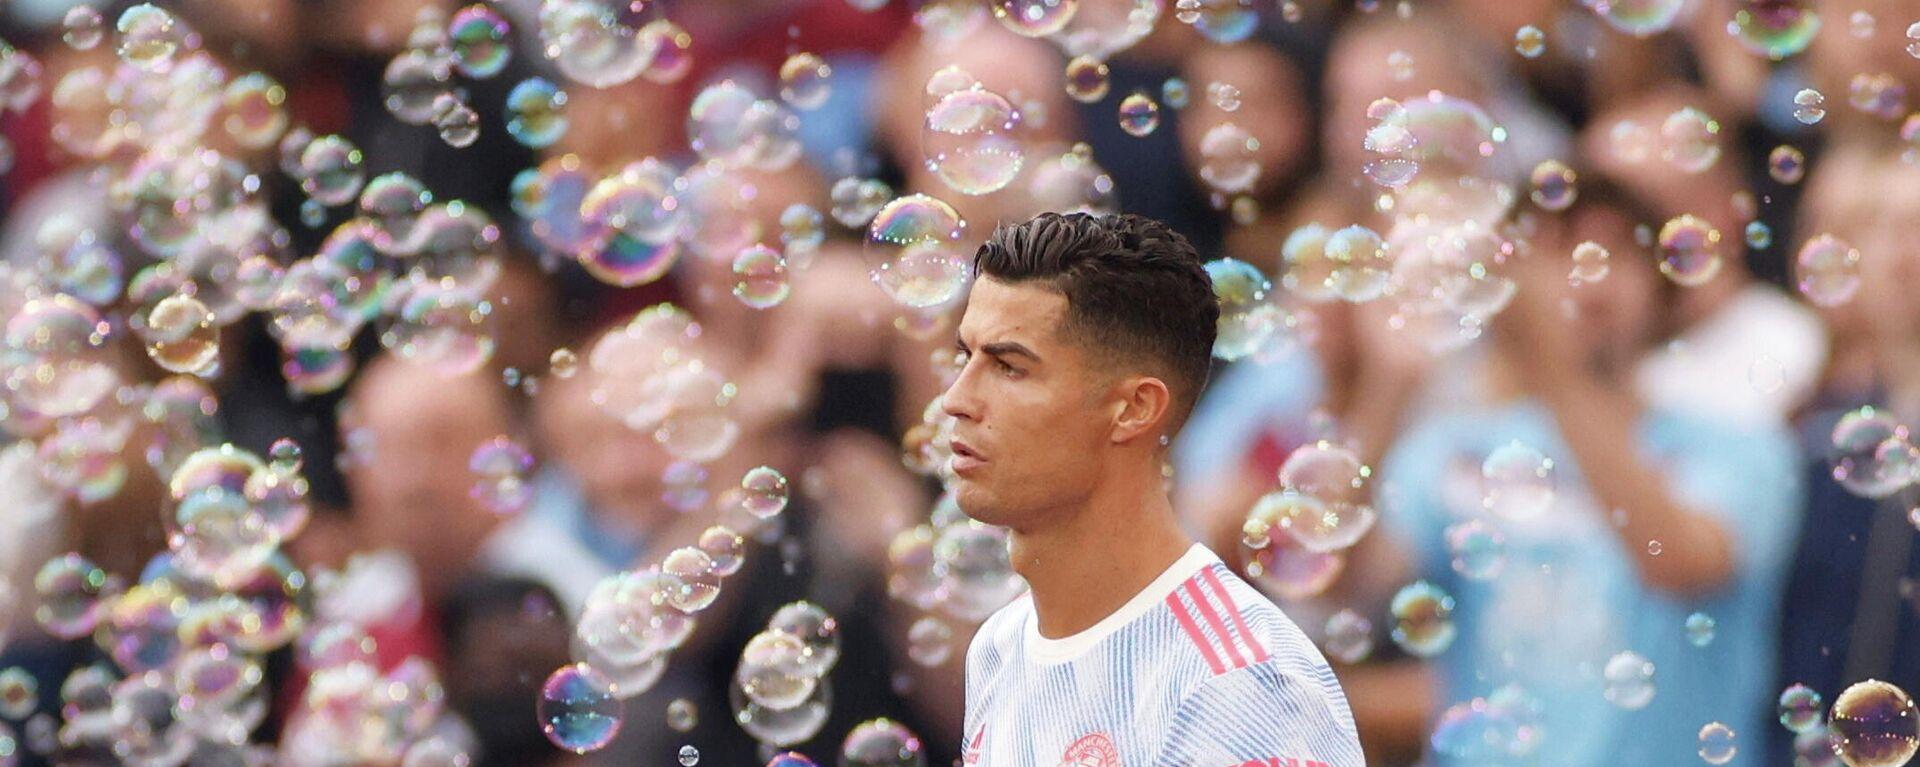 2021 Manchester United's Cristiano Ronaldo before the match - Sputnik International, 1920, 22.09.2021